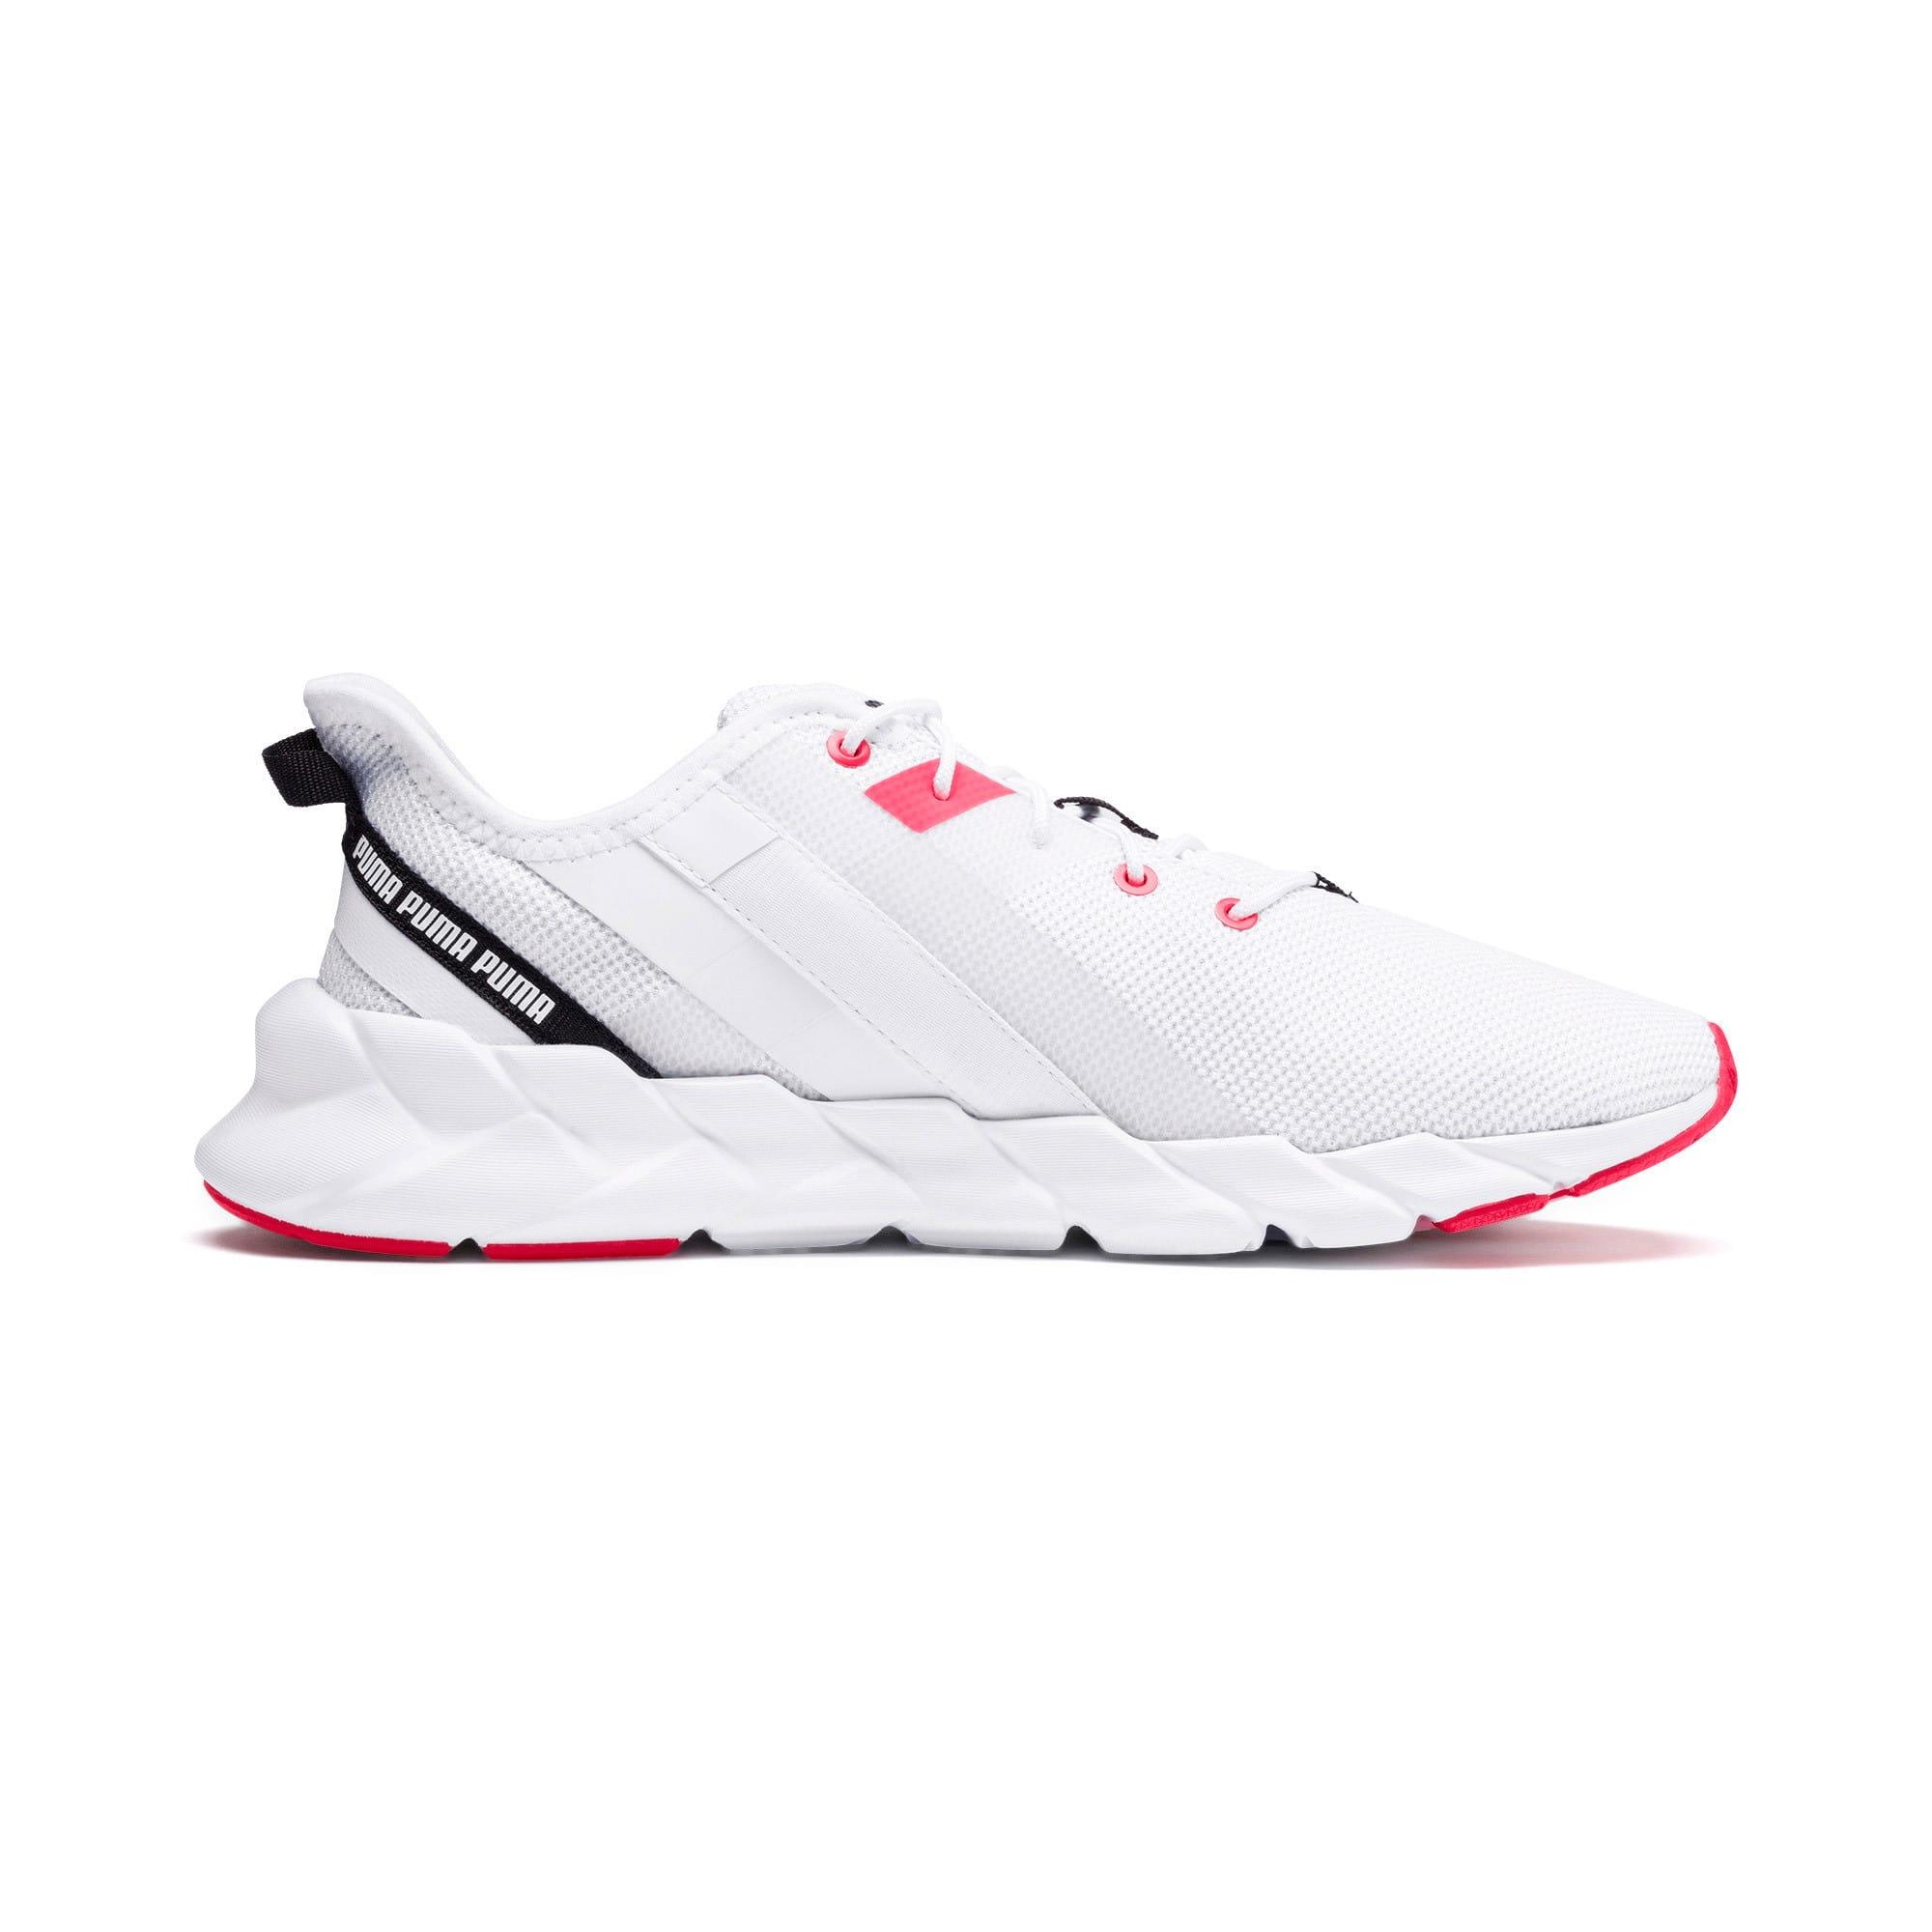 Thumbnail 8 of Weave XT Women's Training Shoes, Puma White-Pink Alert, medium-IND